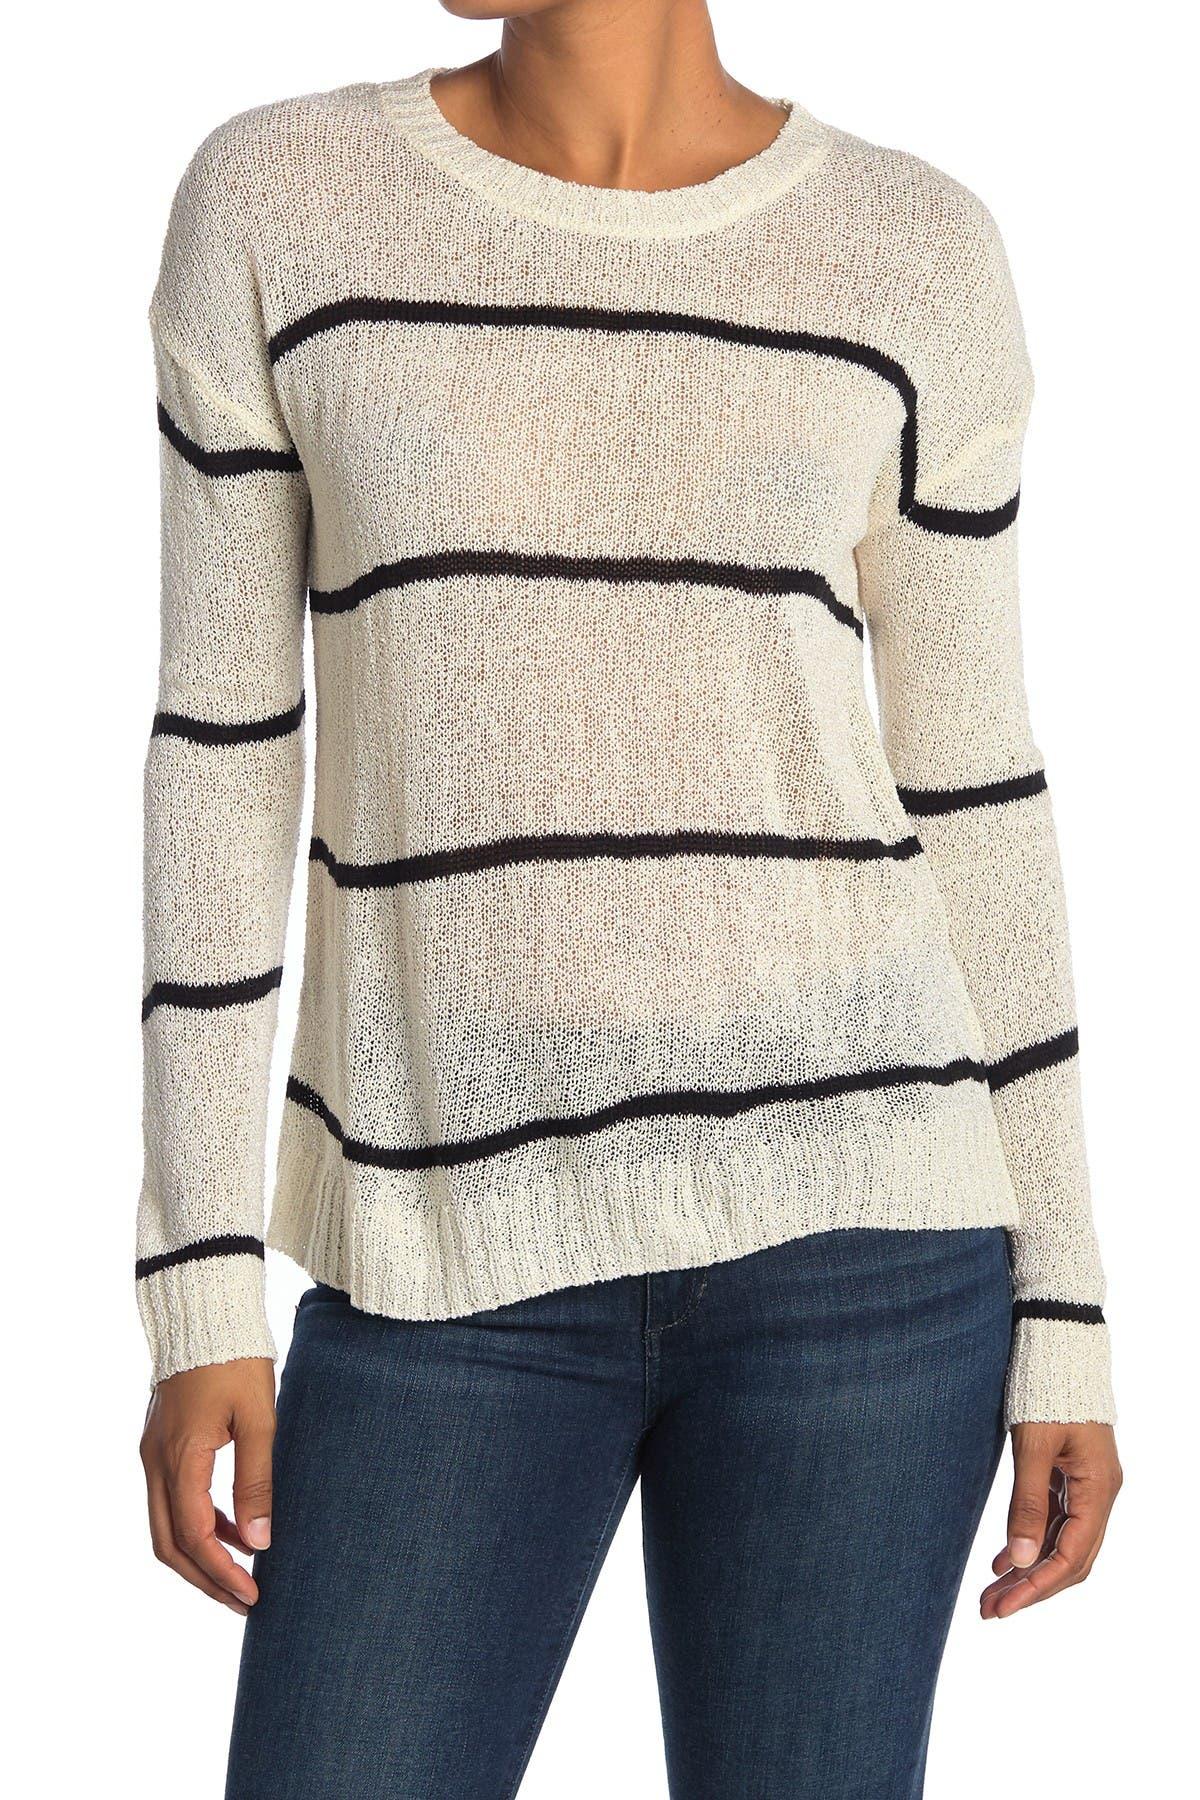 Image of Bobeau Striped Dolman Sweater